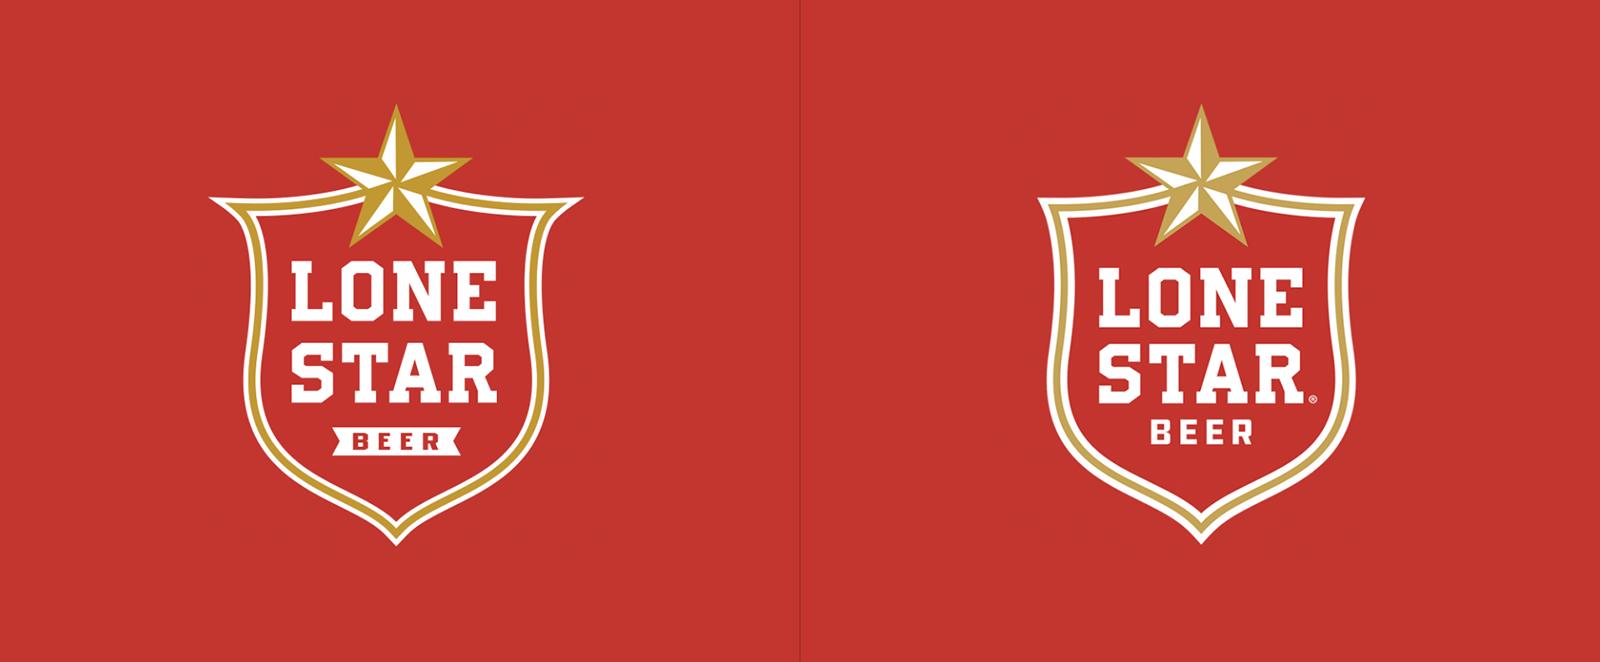 Lone Star孤星啤酒品牌更新全新的品牌VI视觉和包装设计-深圳VI设计